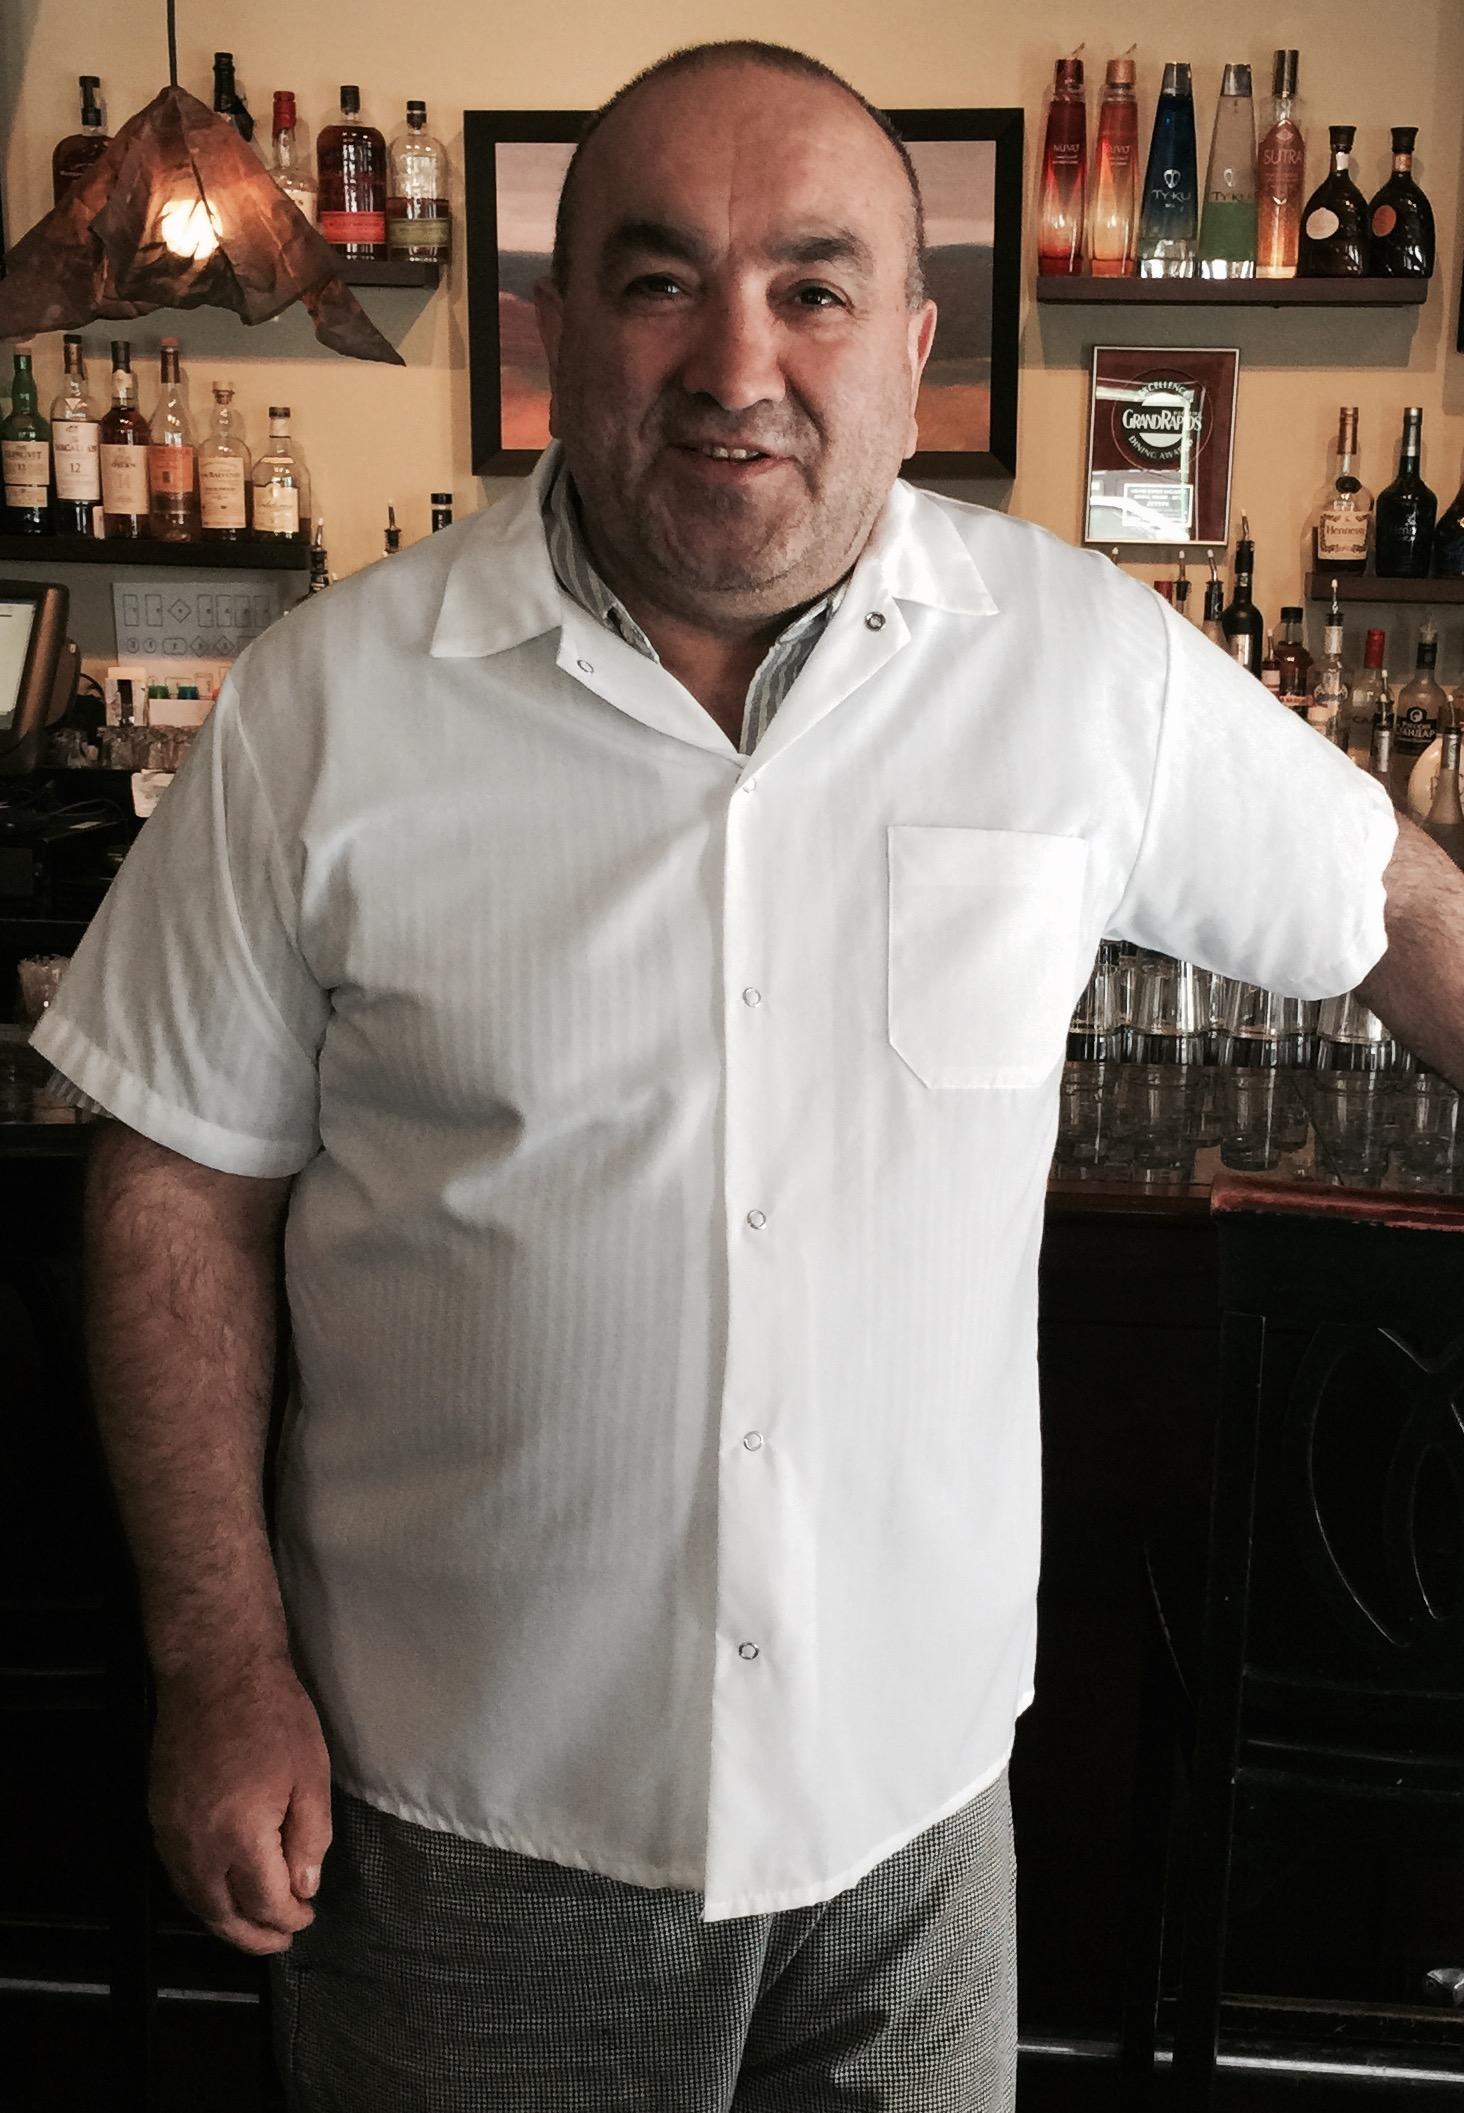 zeytin executive chef - ali tosun - Serving the Ada community since 2006